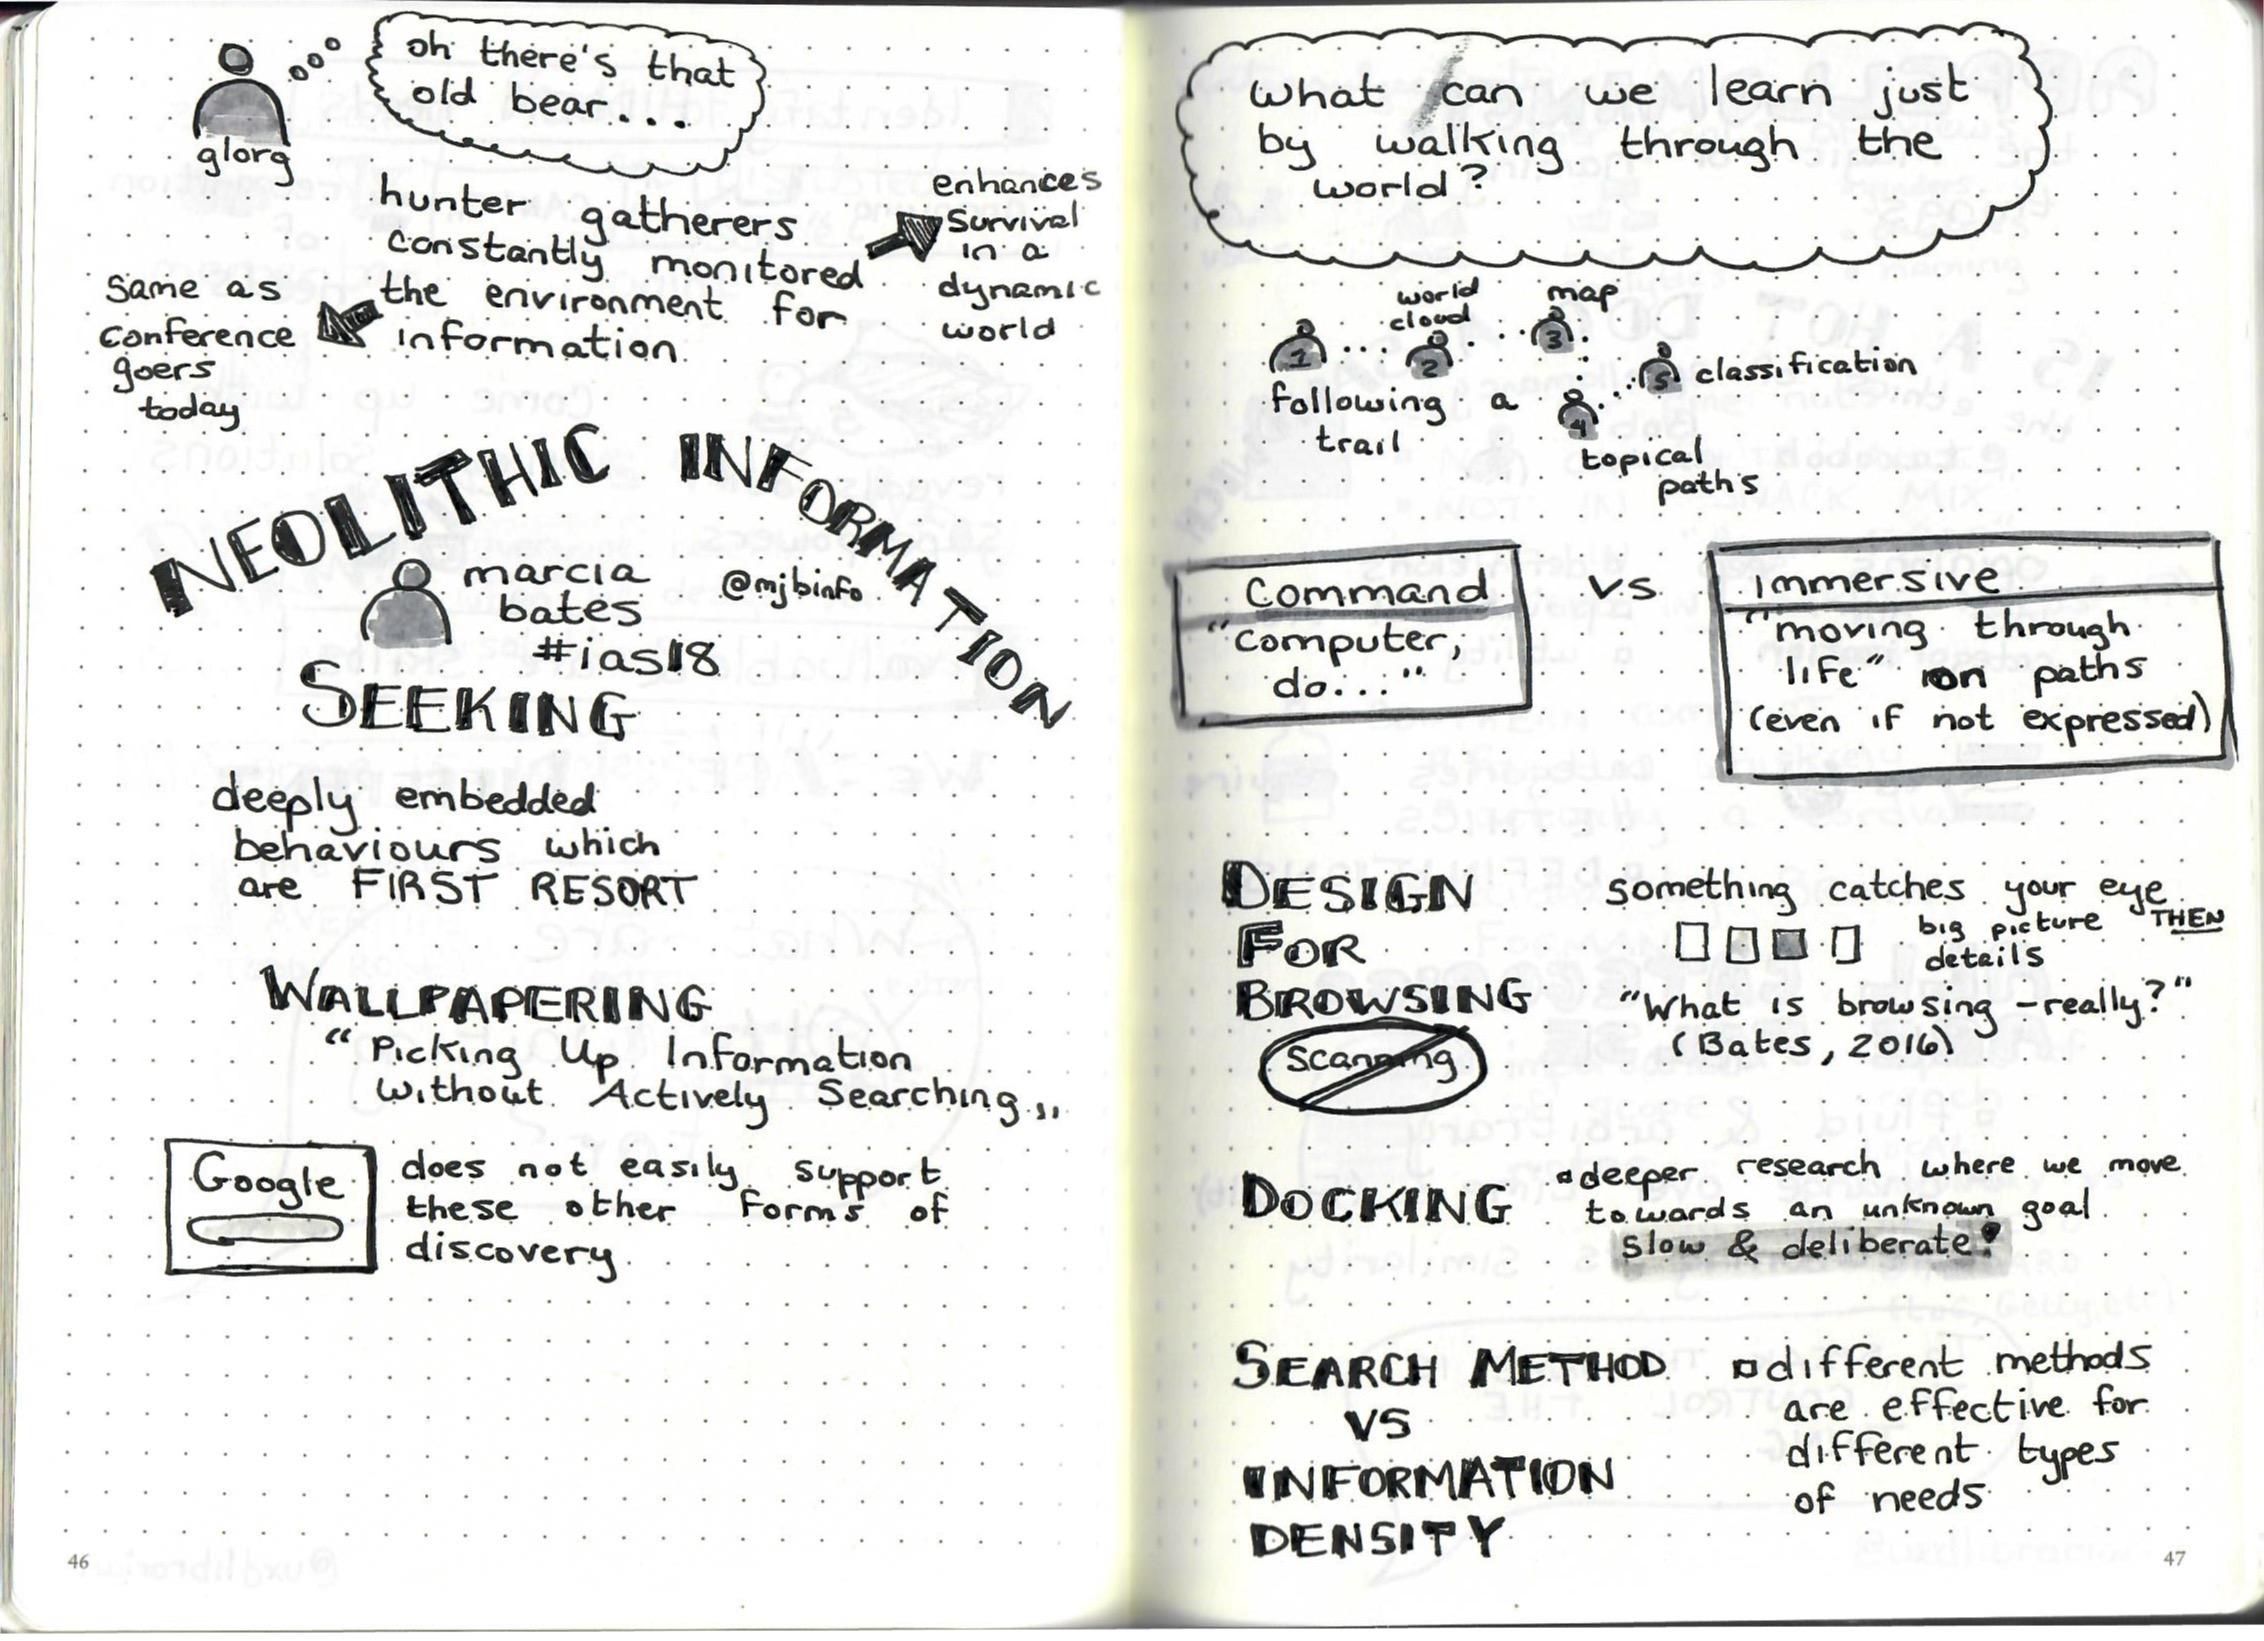 Neolithic Information Seeking (Marcia Bates).jpg